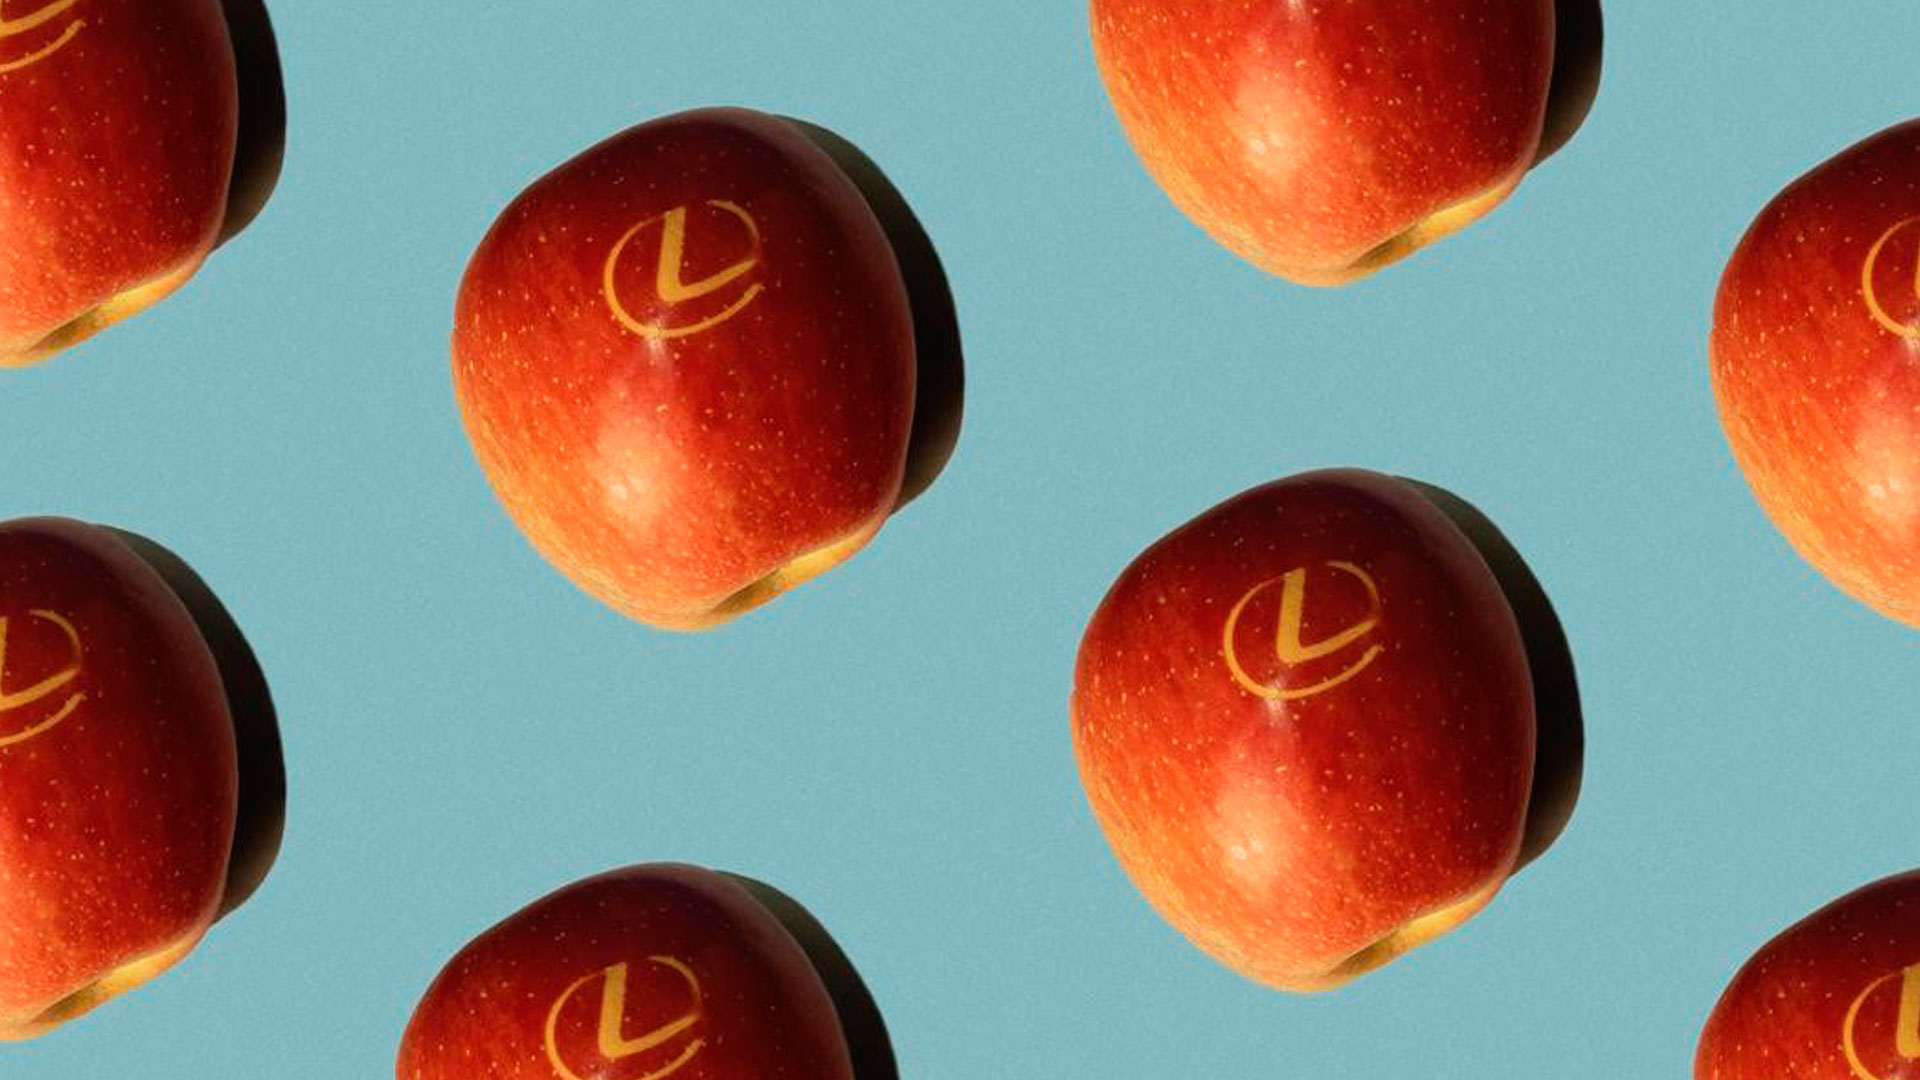 manzanas lexus hero asset